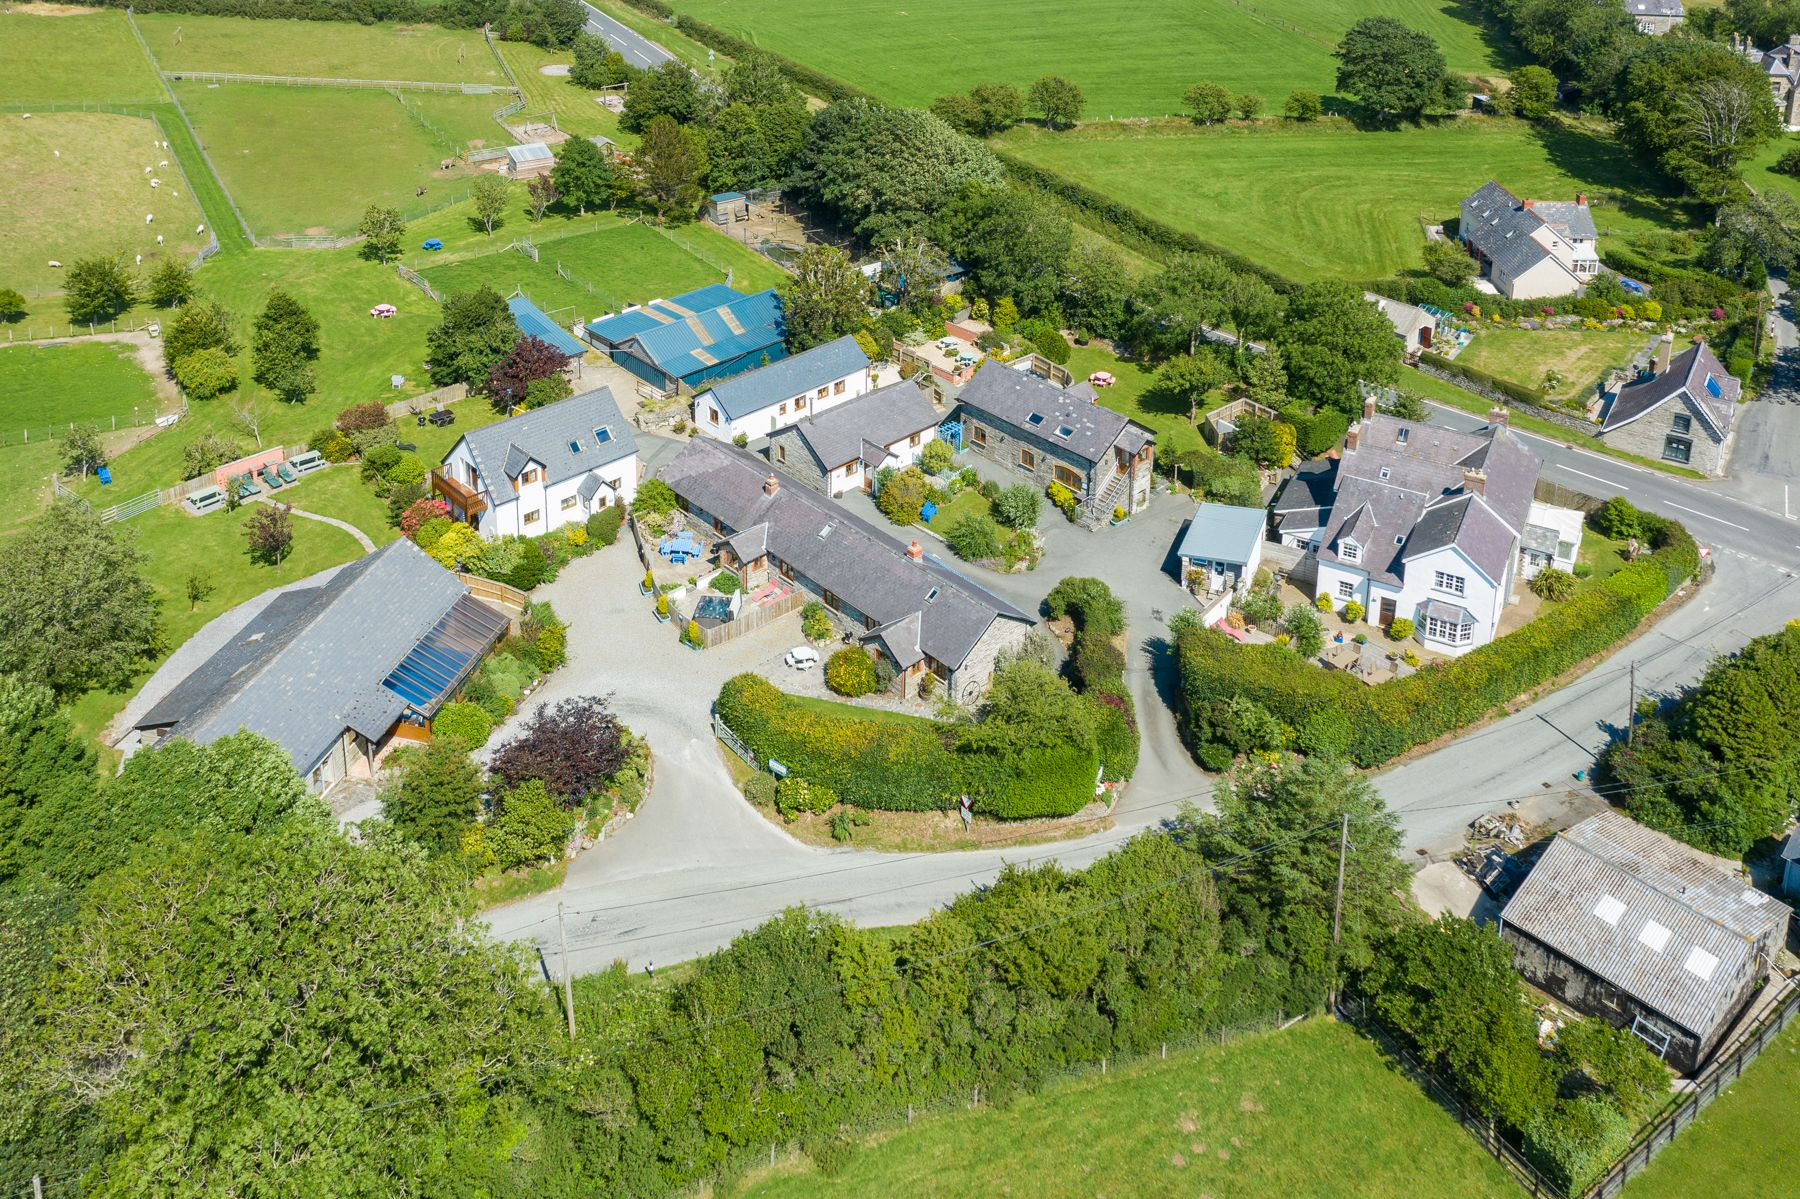 Property photo 1 of 56. Croft Farm - Aerials  - Final Edits_ Web Sized-7 - Copy